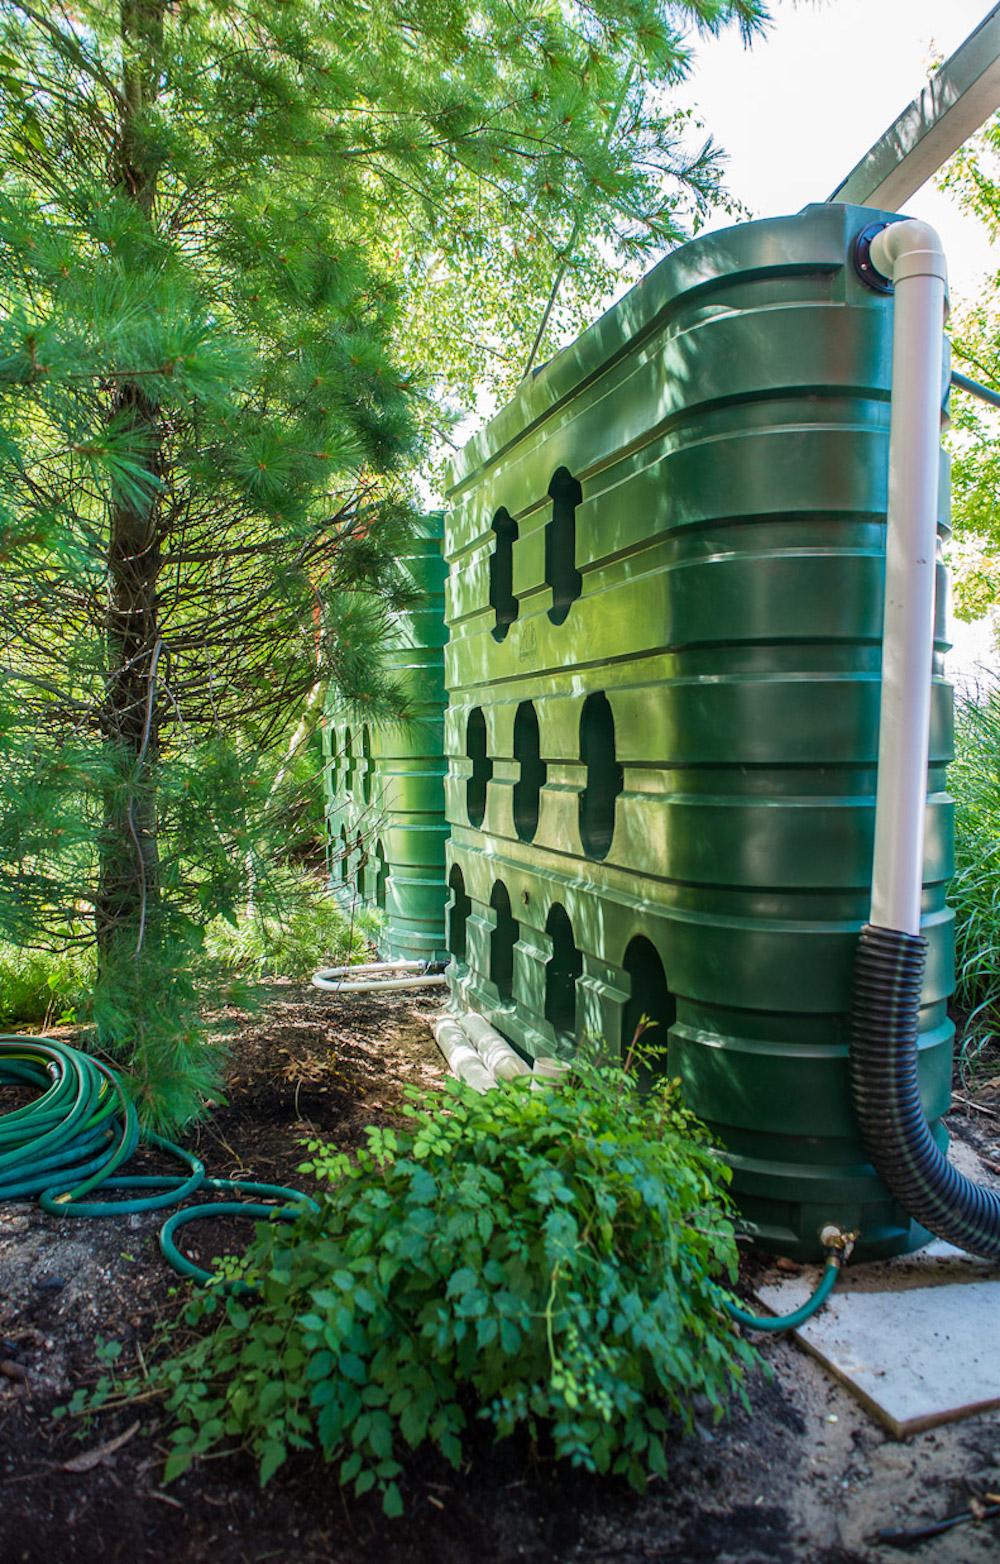 ecogardens-saugatuck-center-8.jpg